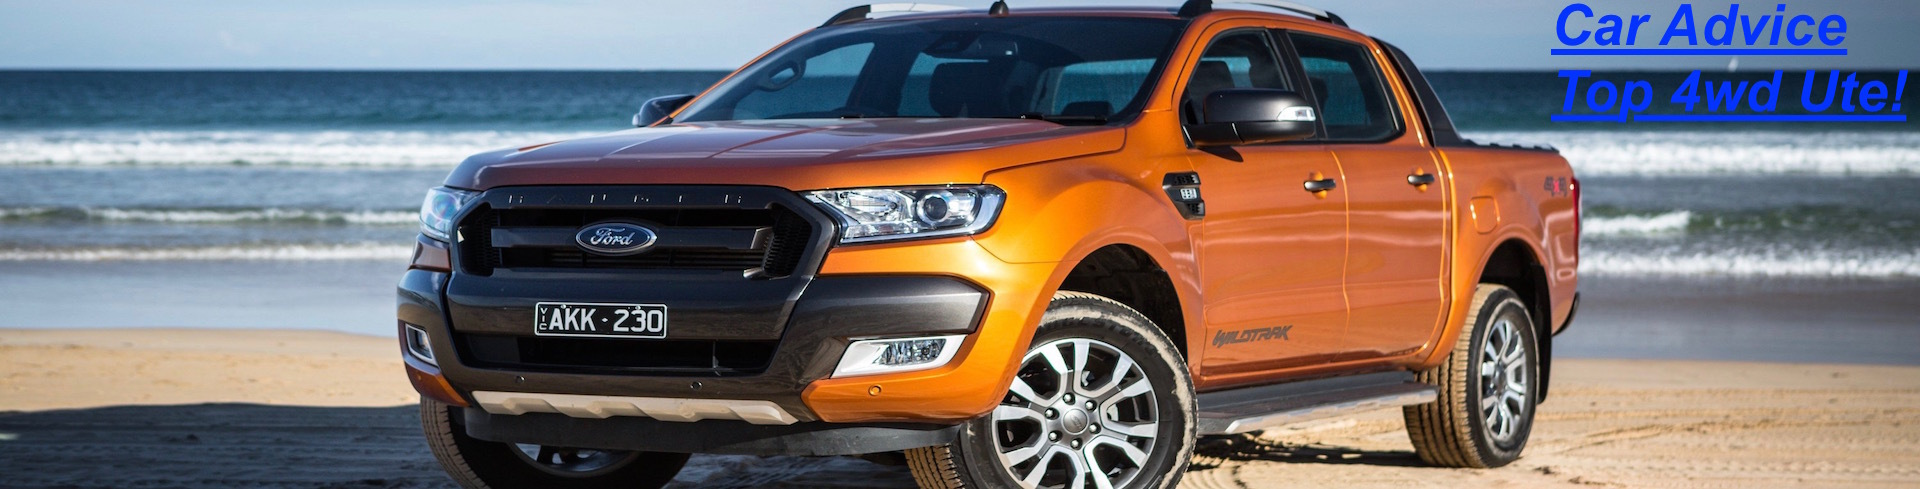 Car Advice article - Top 5 Utes